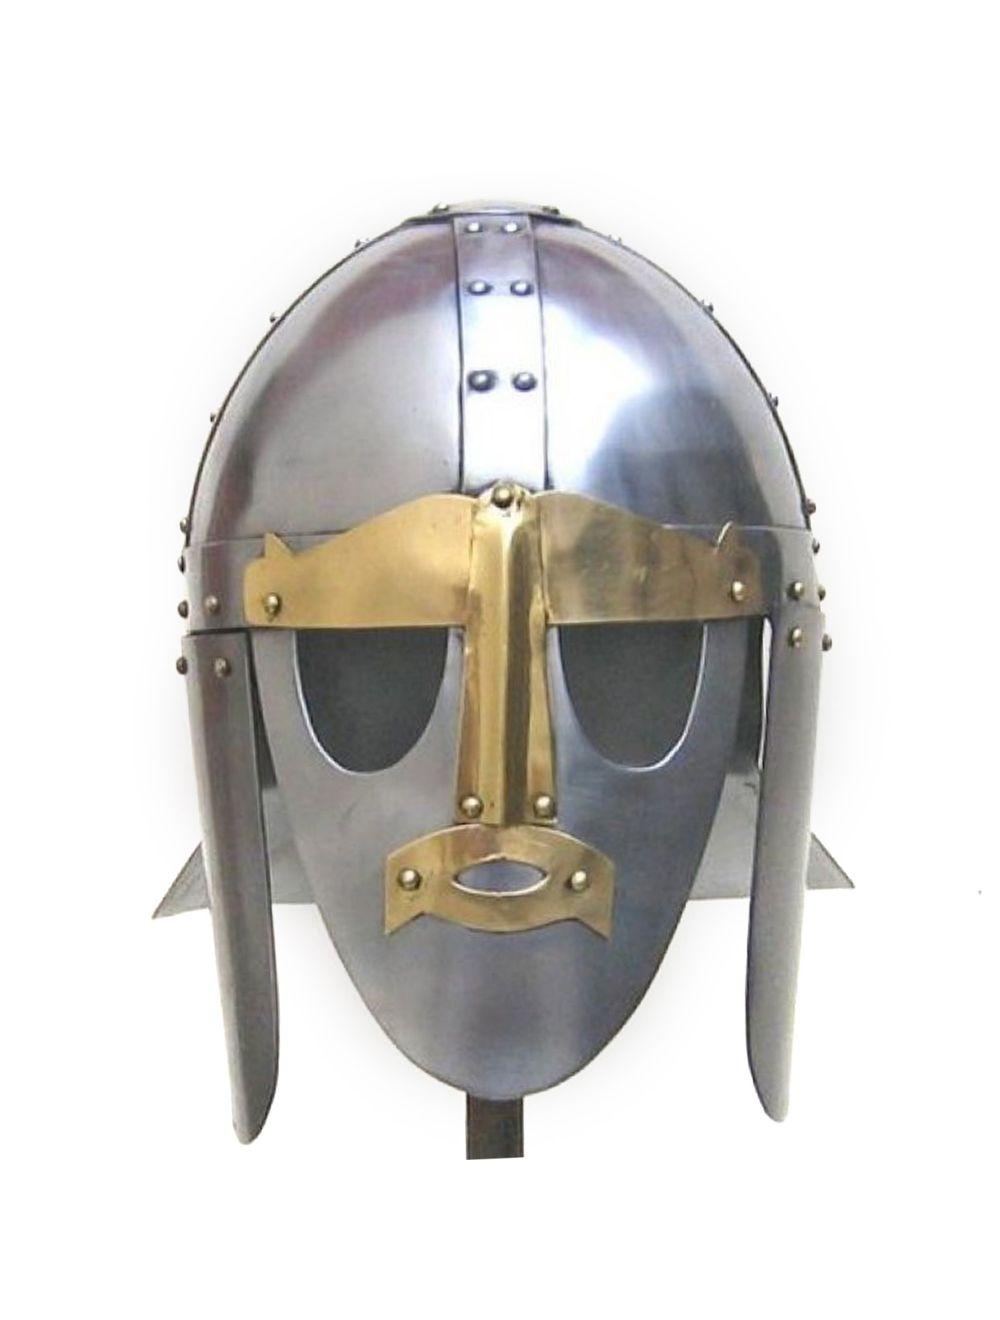 Armor Helmet, Sutton Hoo